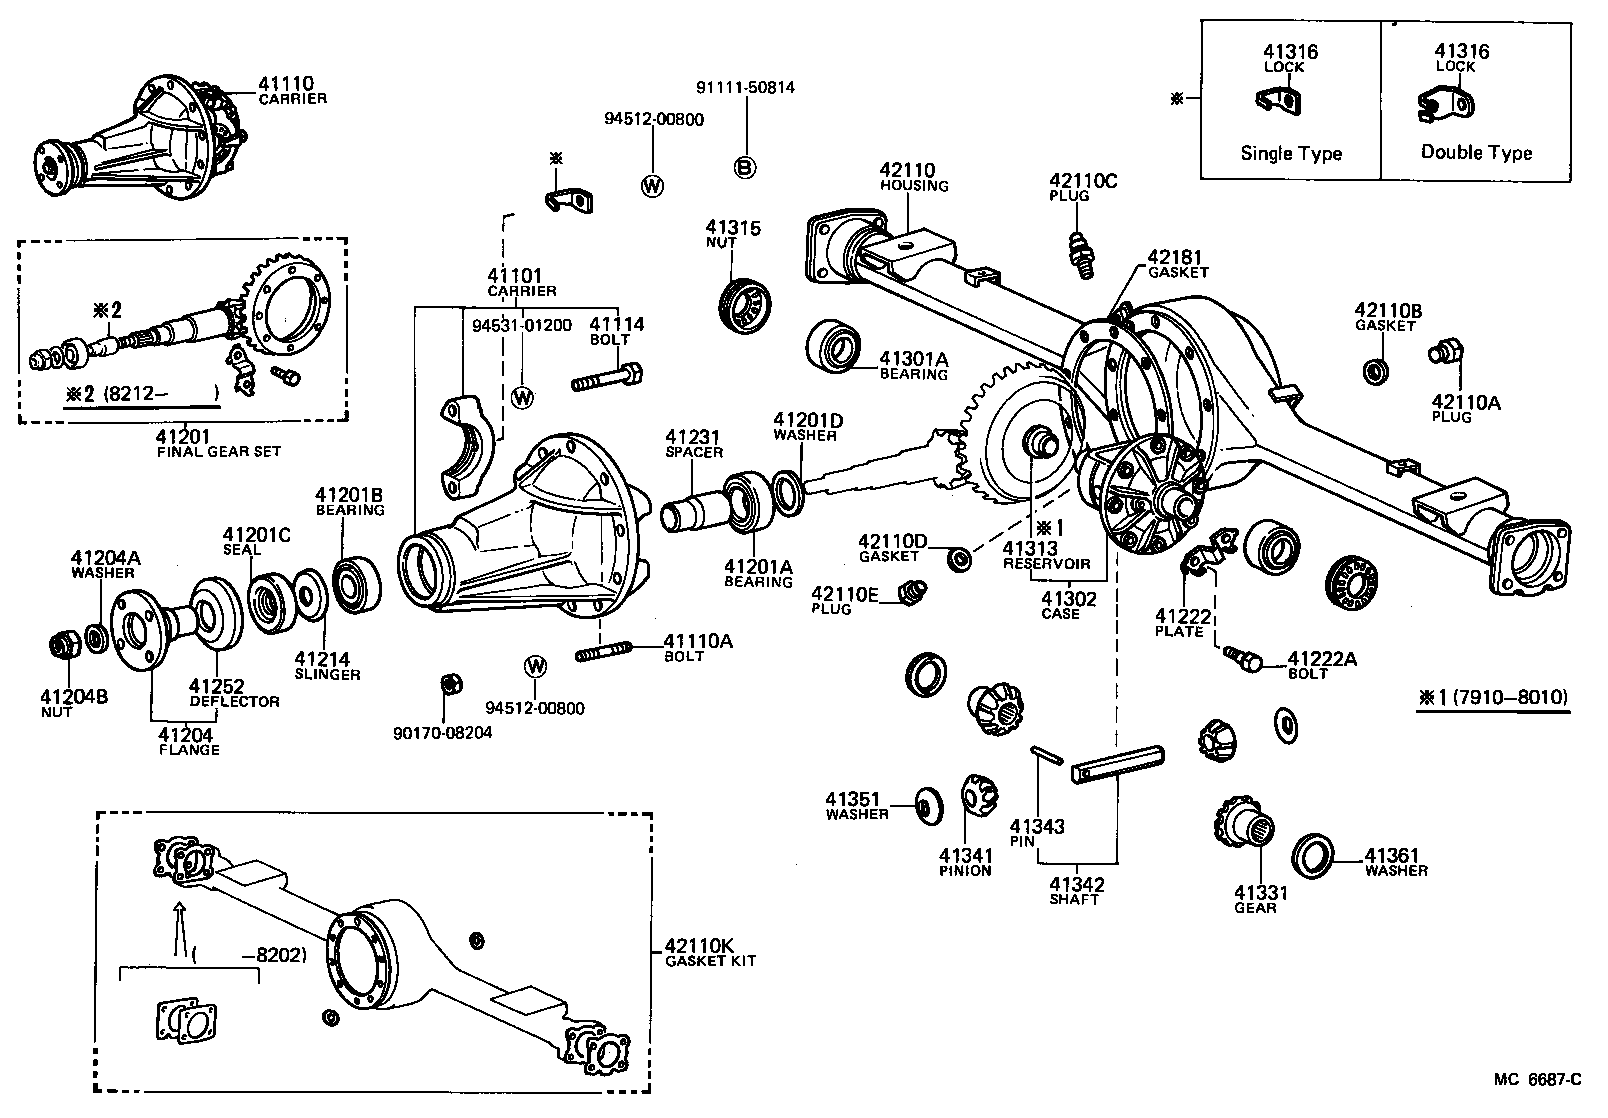 Toyota Fj Cruiser Fuse Box Location